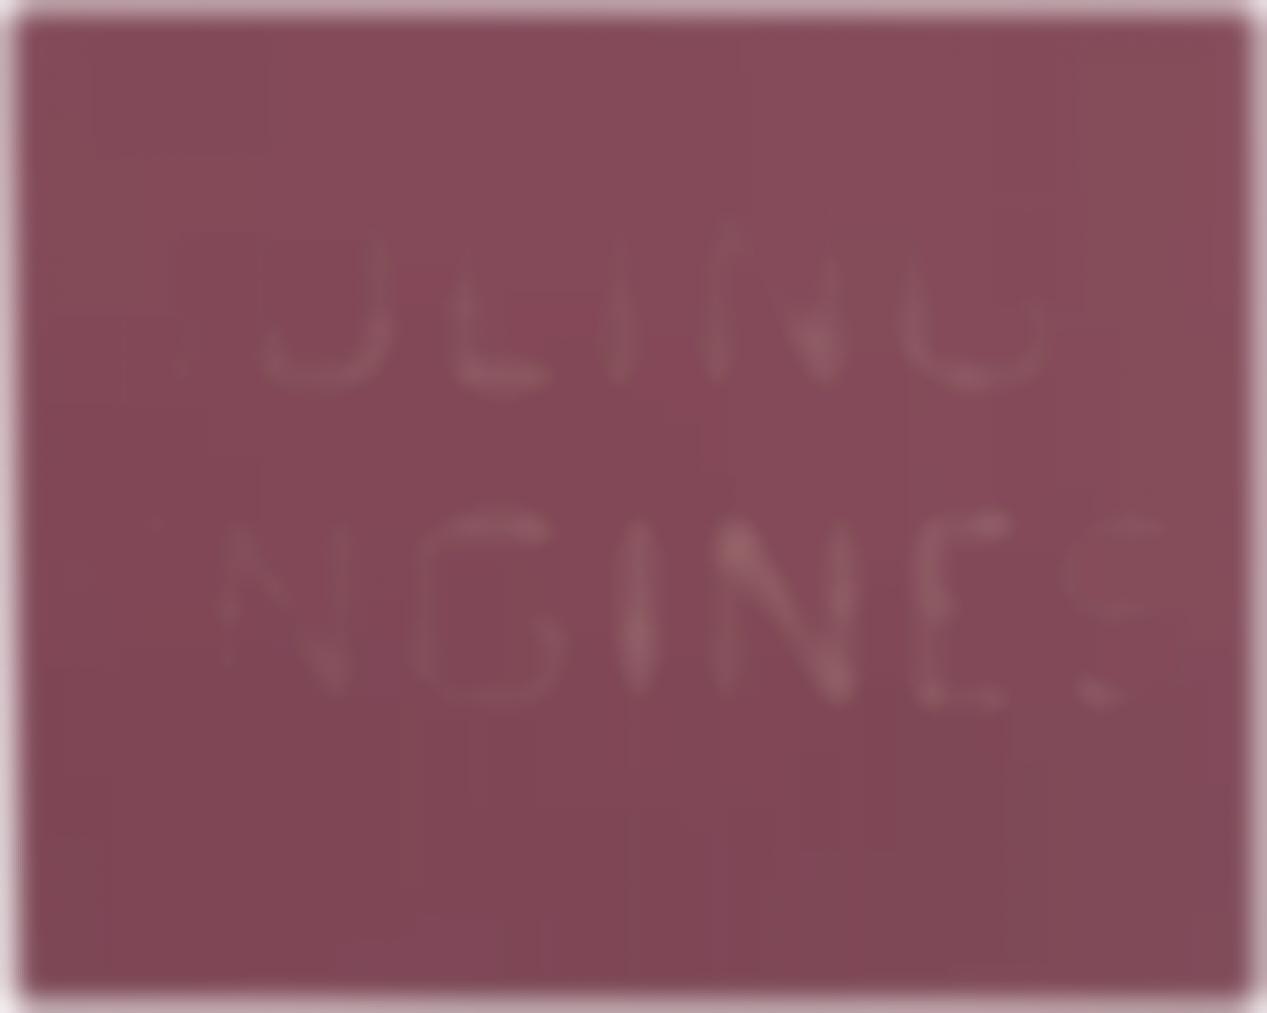 Ed Ruscha-Idling Engines-2012